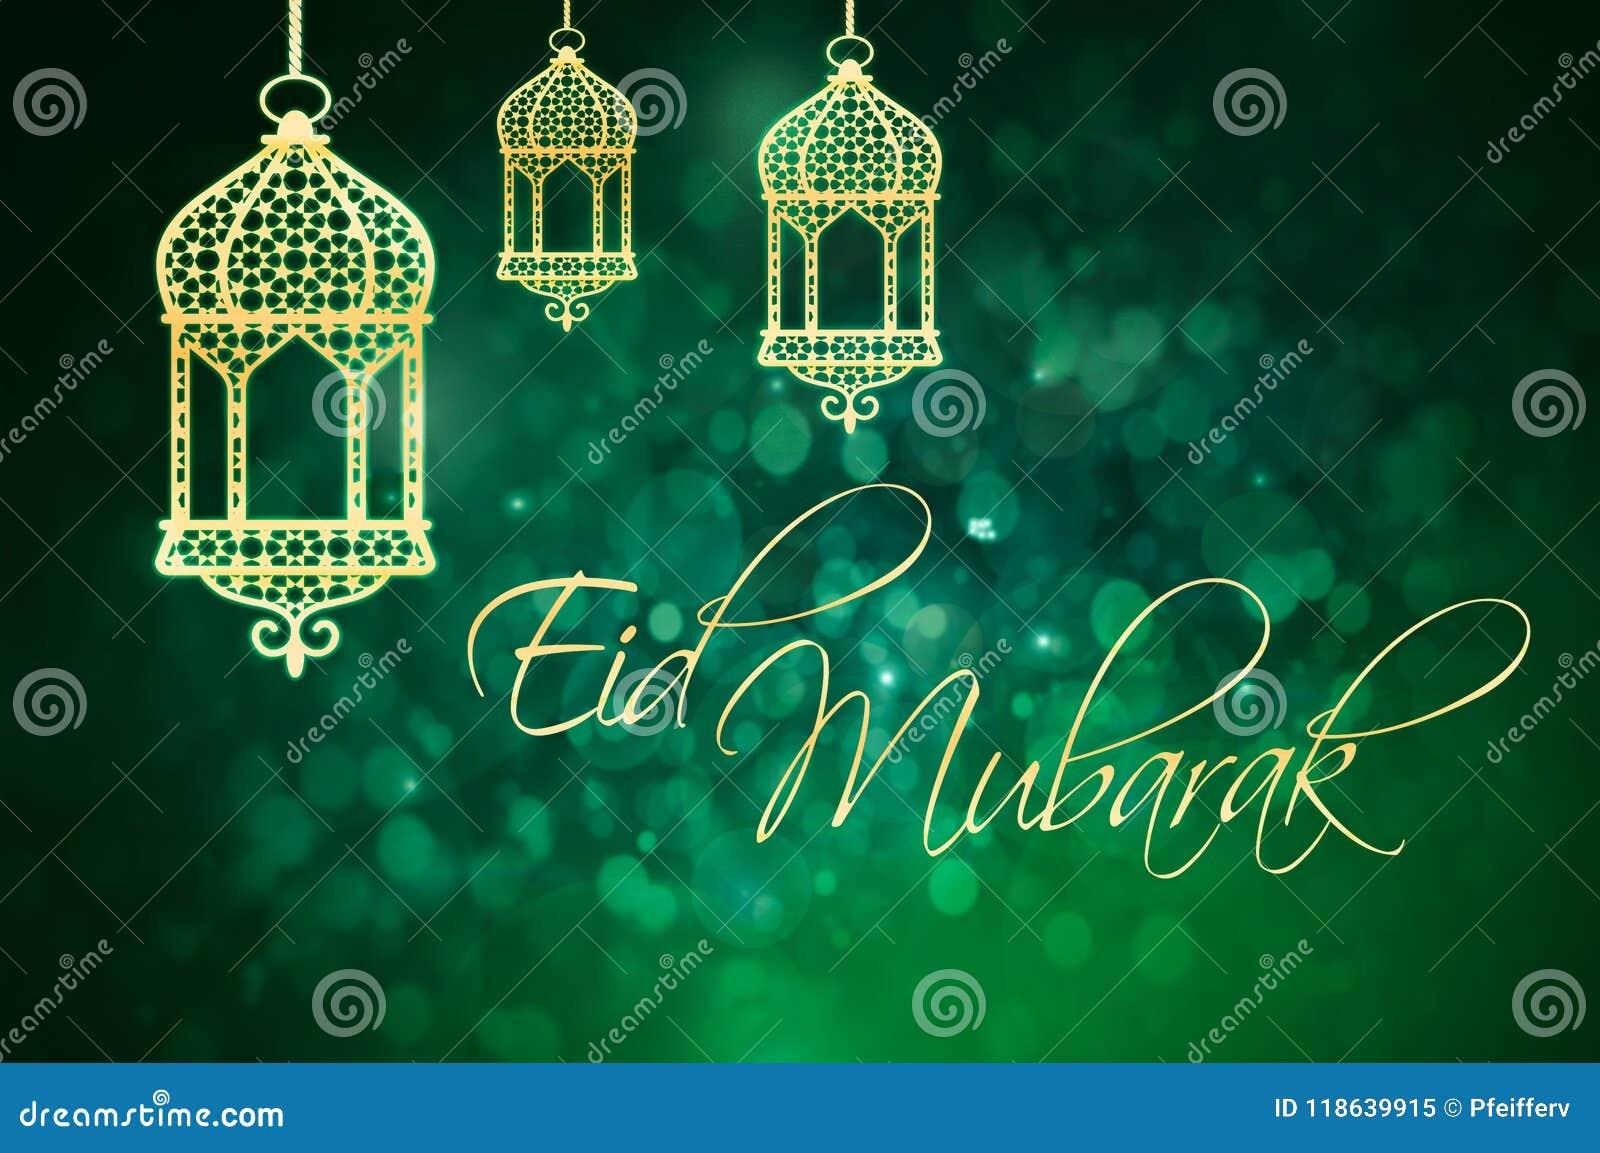 Eid mubarak greeting for islamic holidays eid al fitr and eid a download eid mubarak greeting for islamic holidays eid al fitr and eid a stock m4hsunfo